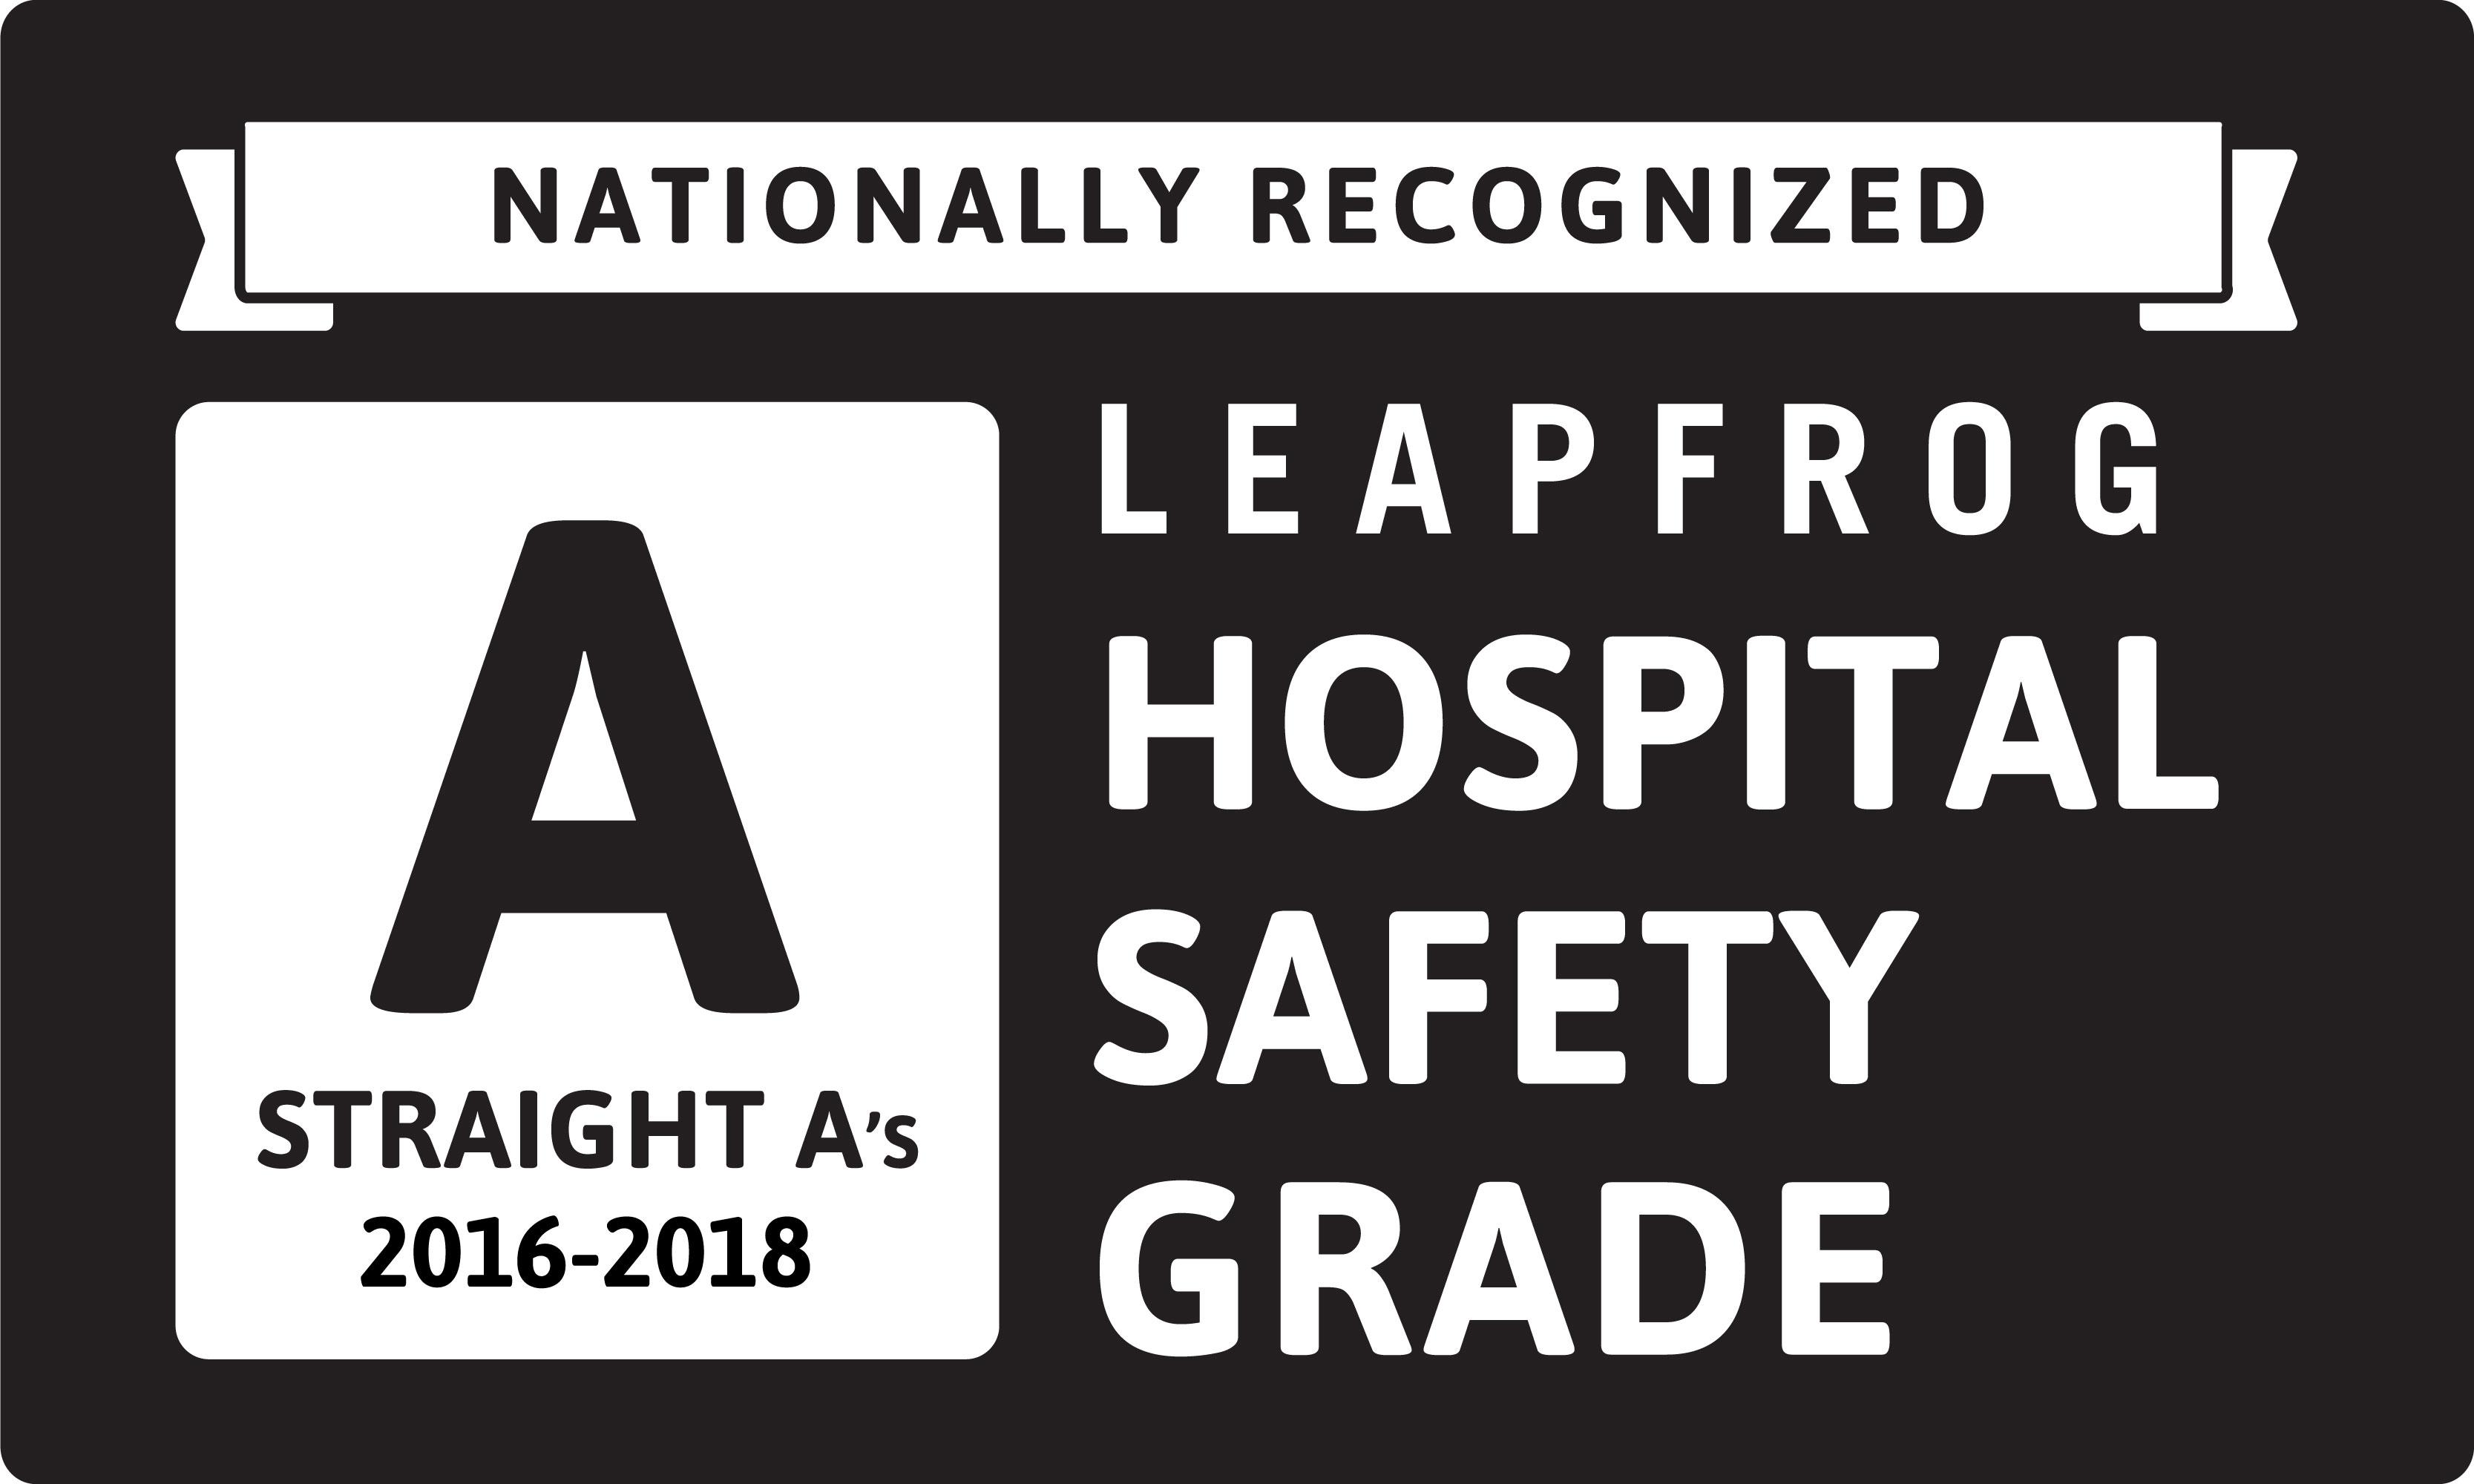 Leapfrog A Safety Grade